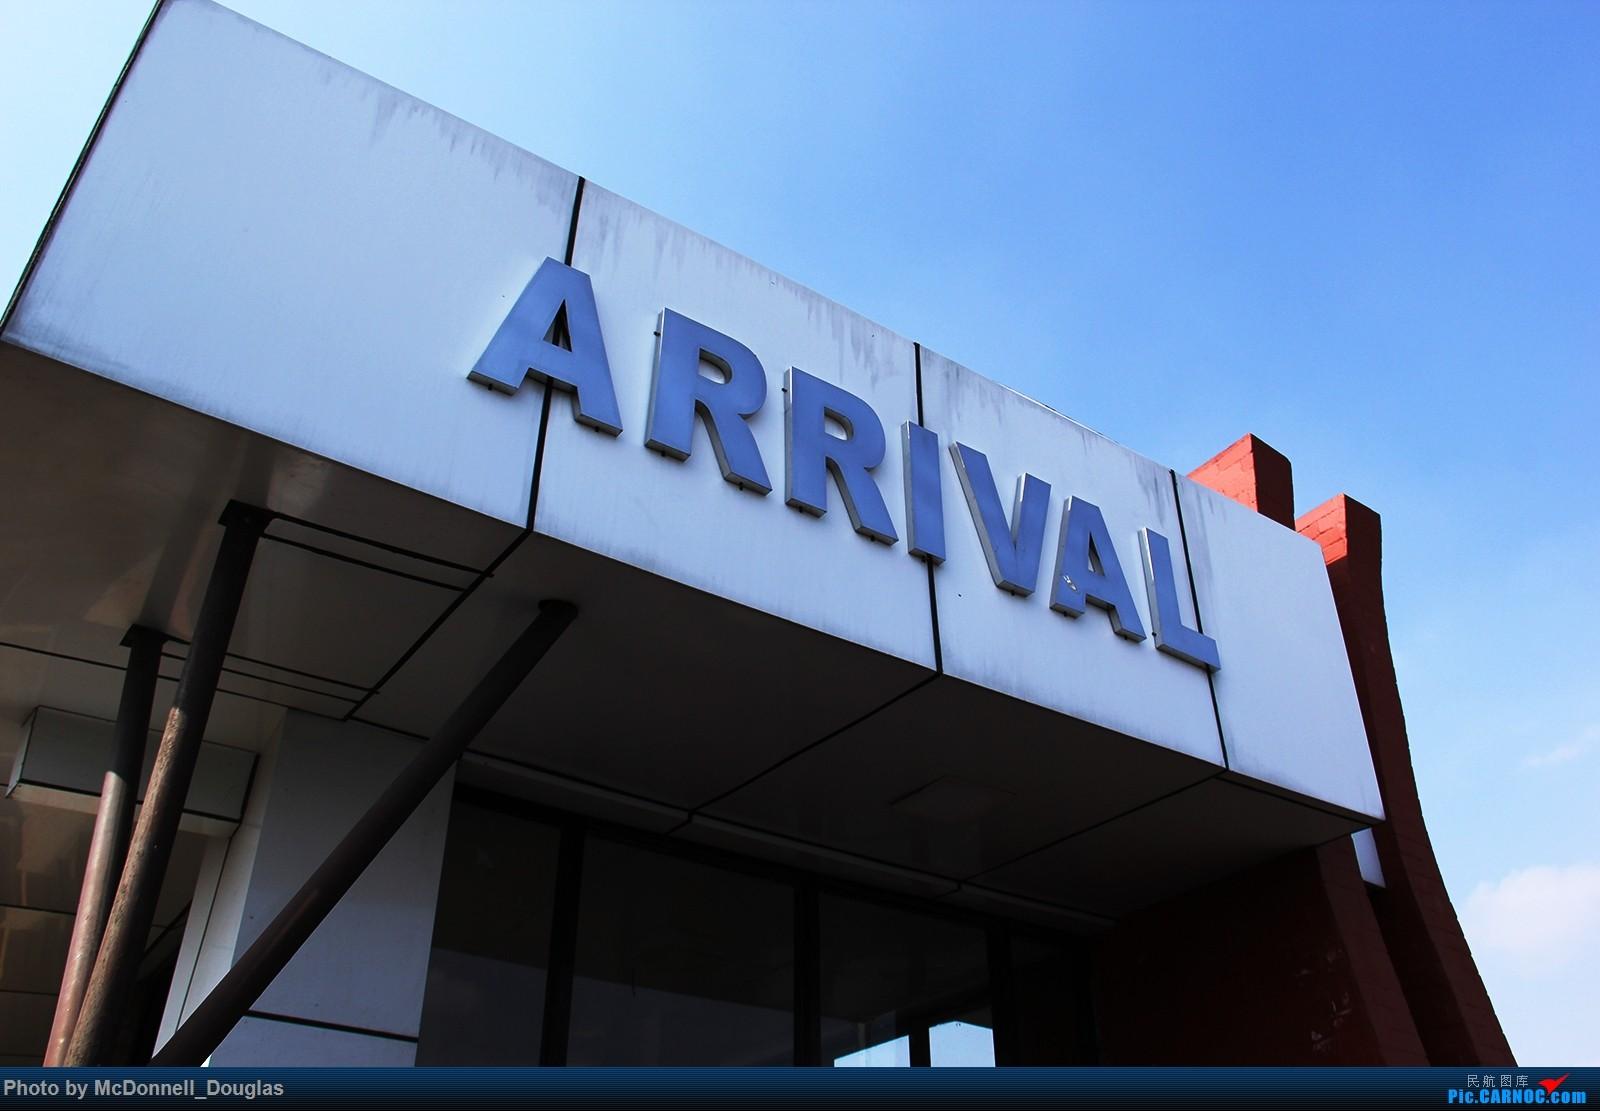 Re:[原创]【上海飞友会】【zc带你游天下(4)】不远千里飞跃喜马拉雅去看你,探寻高山另一边的神秘国度,和一群贫穷却快乐着的人们 XIAN MA60 9N-AKQ 尼泊尔加德满都特里布万国际机场 尼泊尔加德满都特里布万国际机场